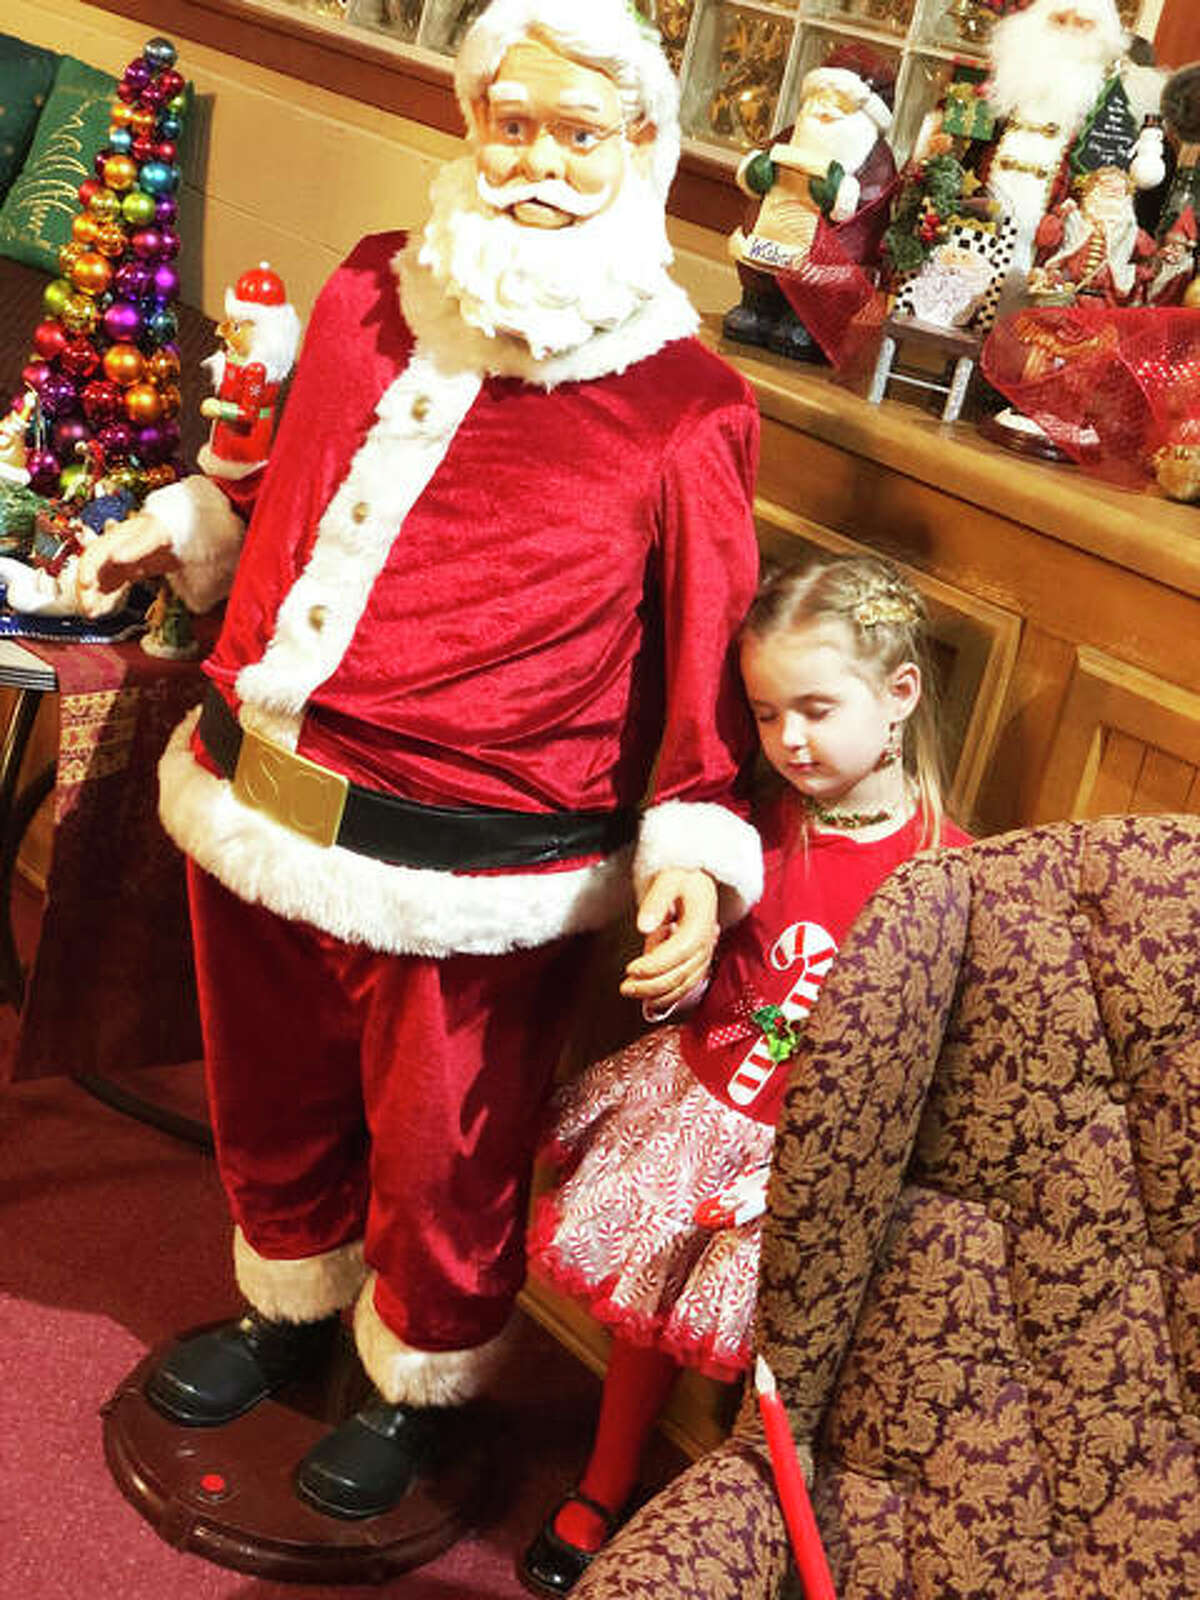 Jolie McAfoos, 4, dreams of meeting a